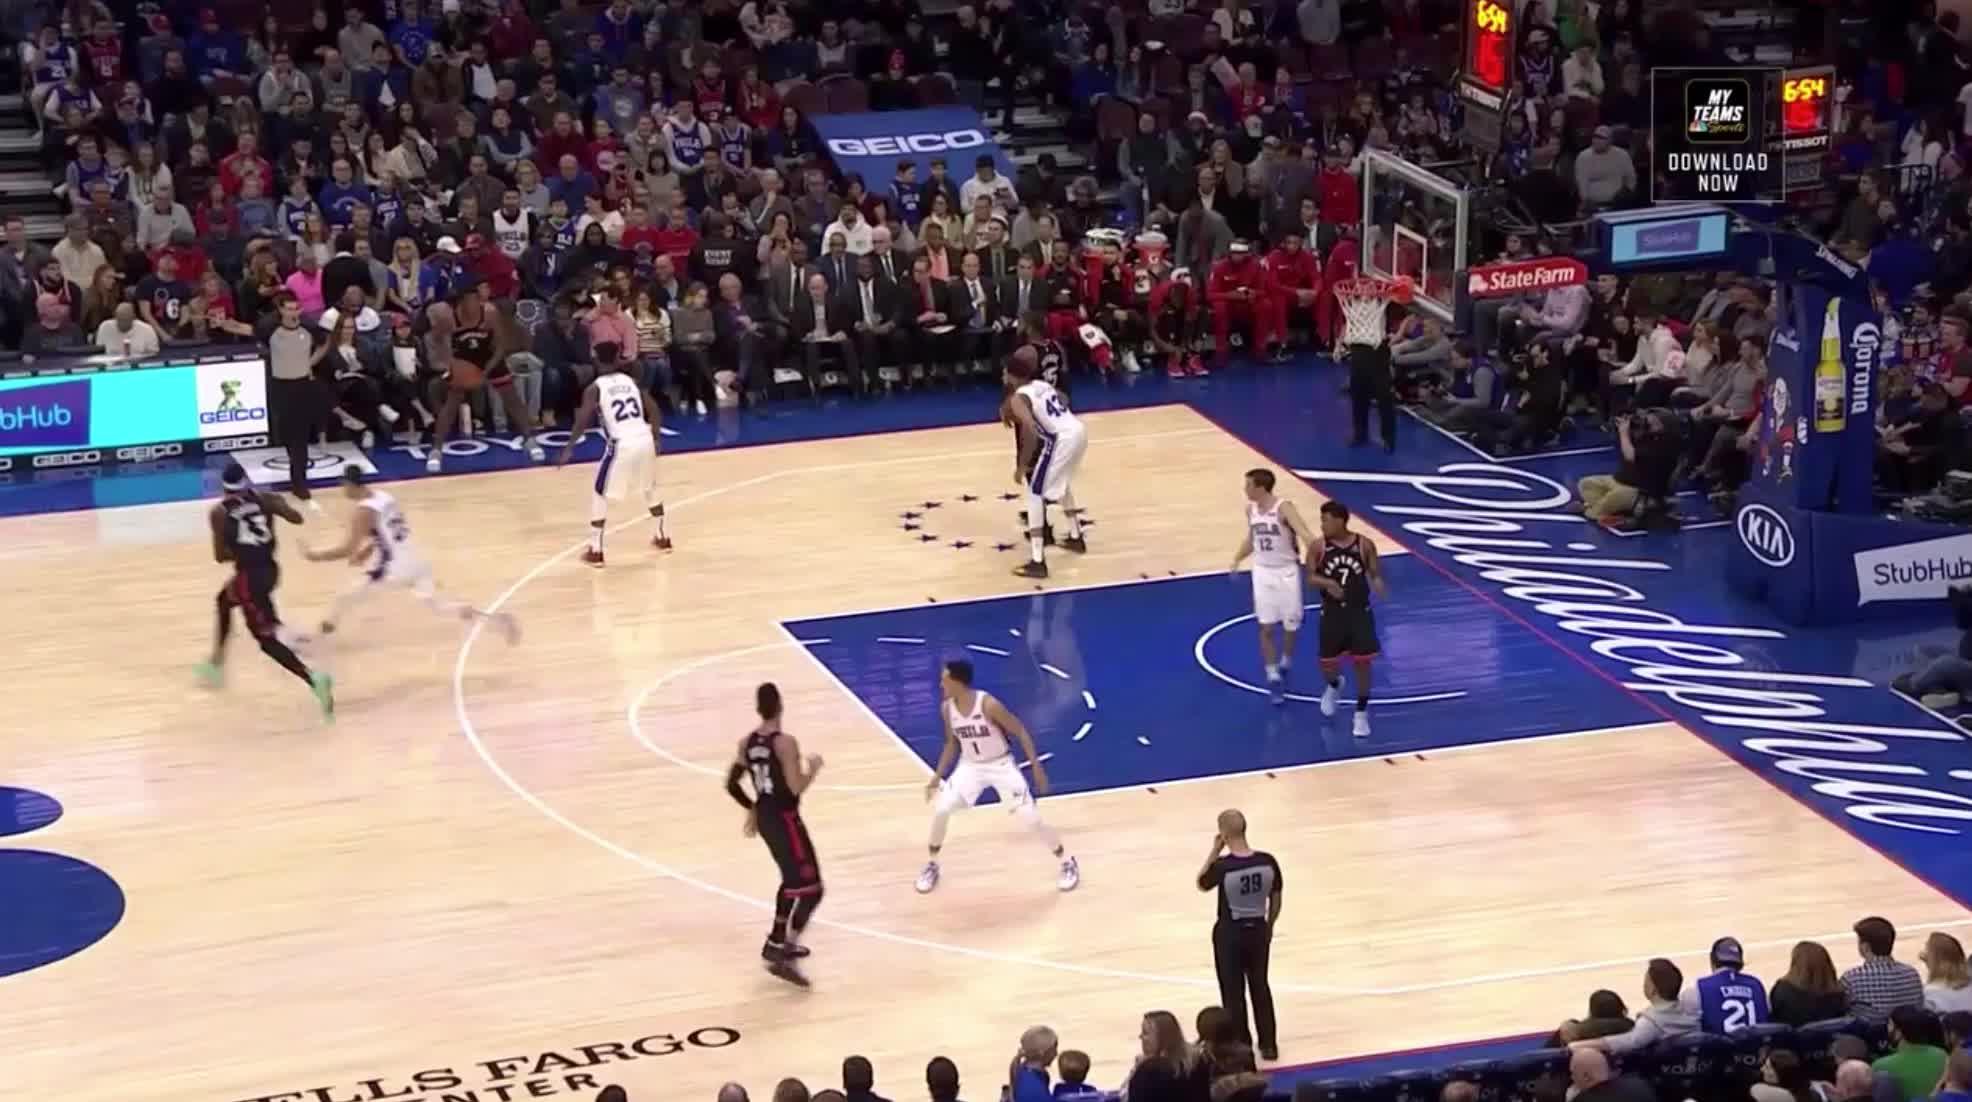 NBA, Jonah Bolden_Monroe block and ORB rush GIFs